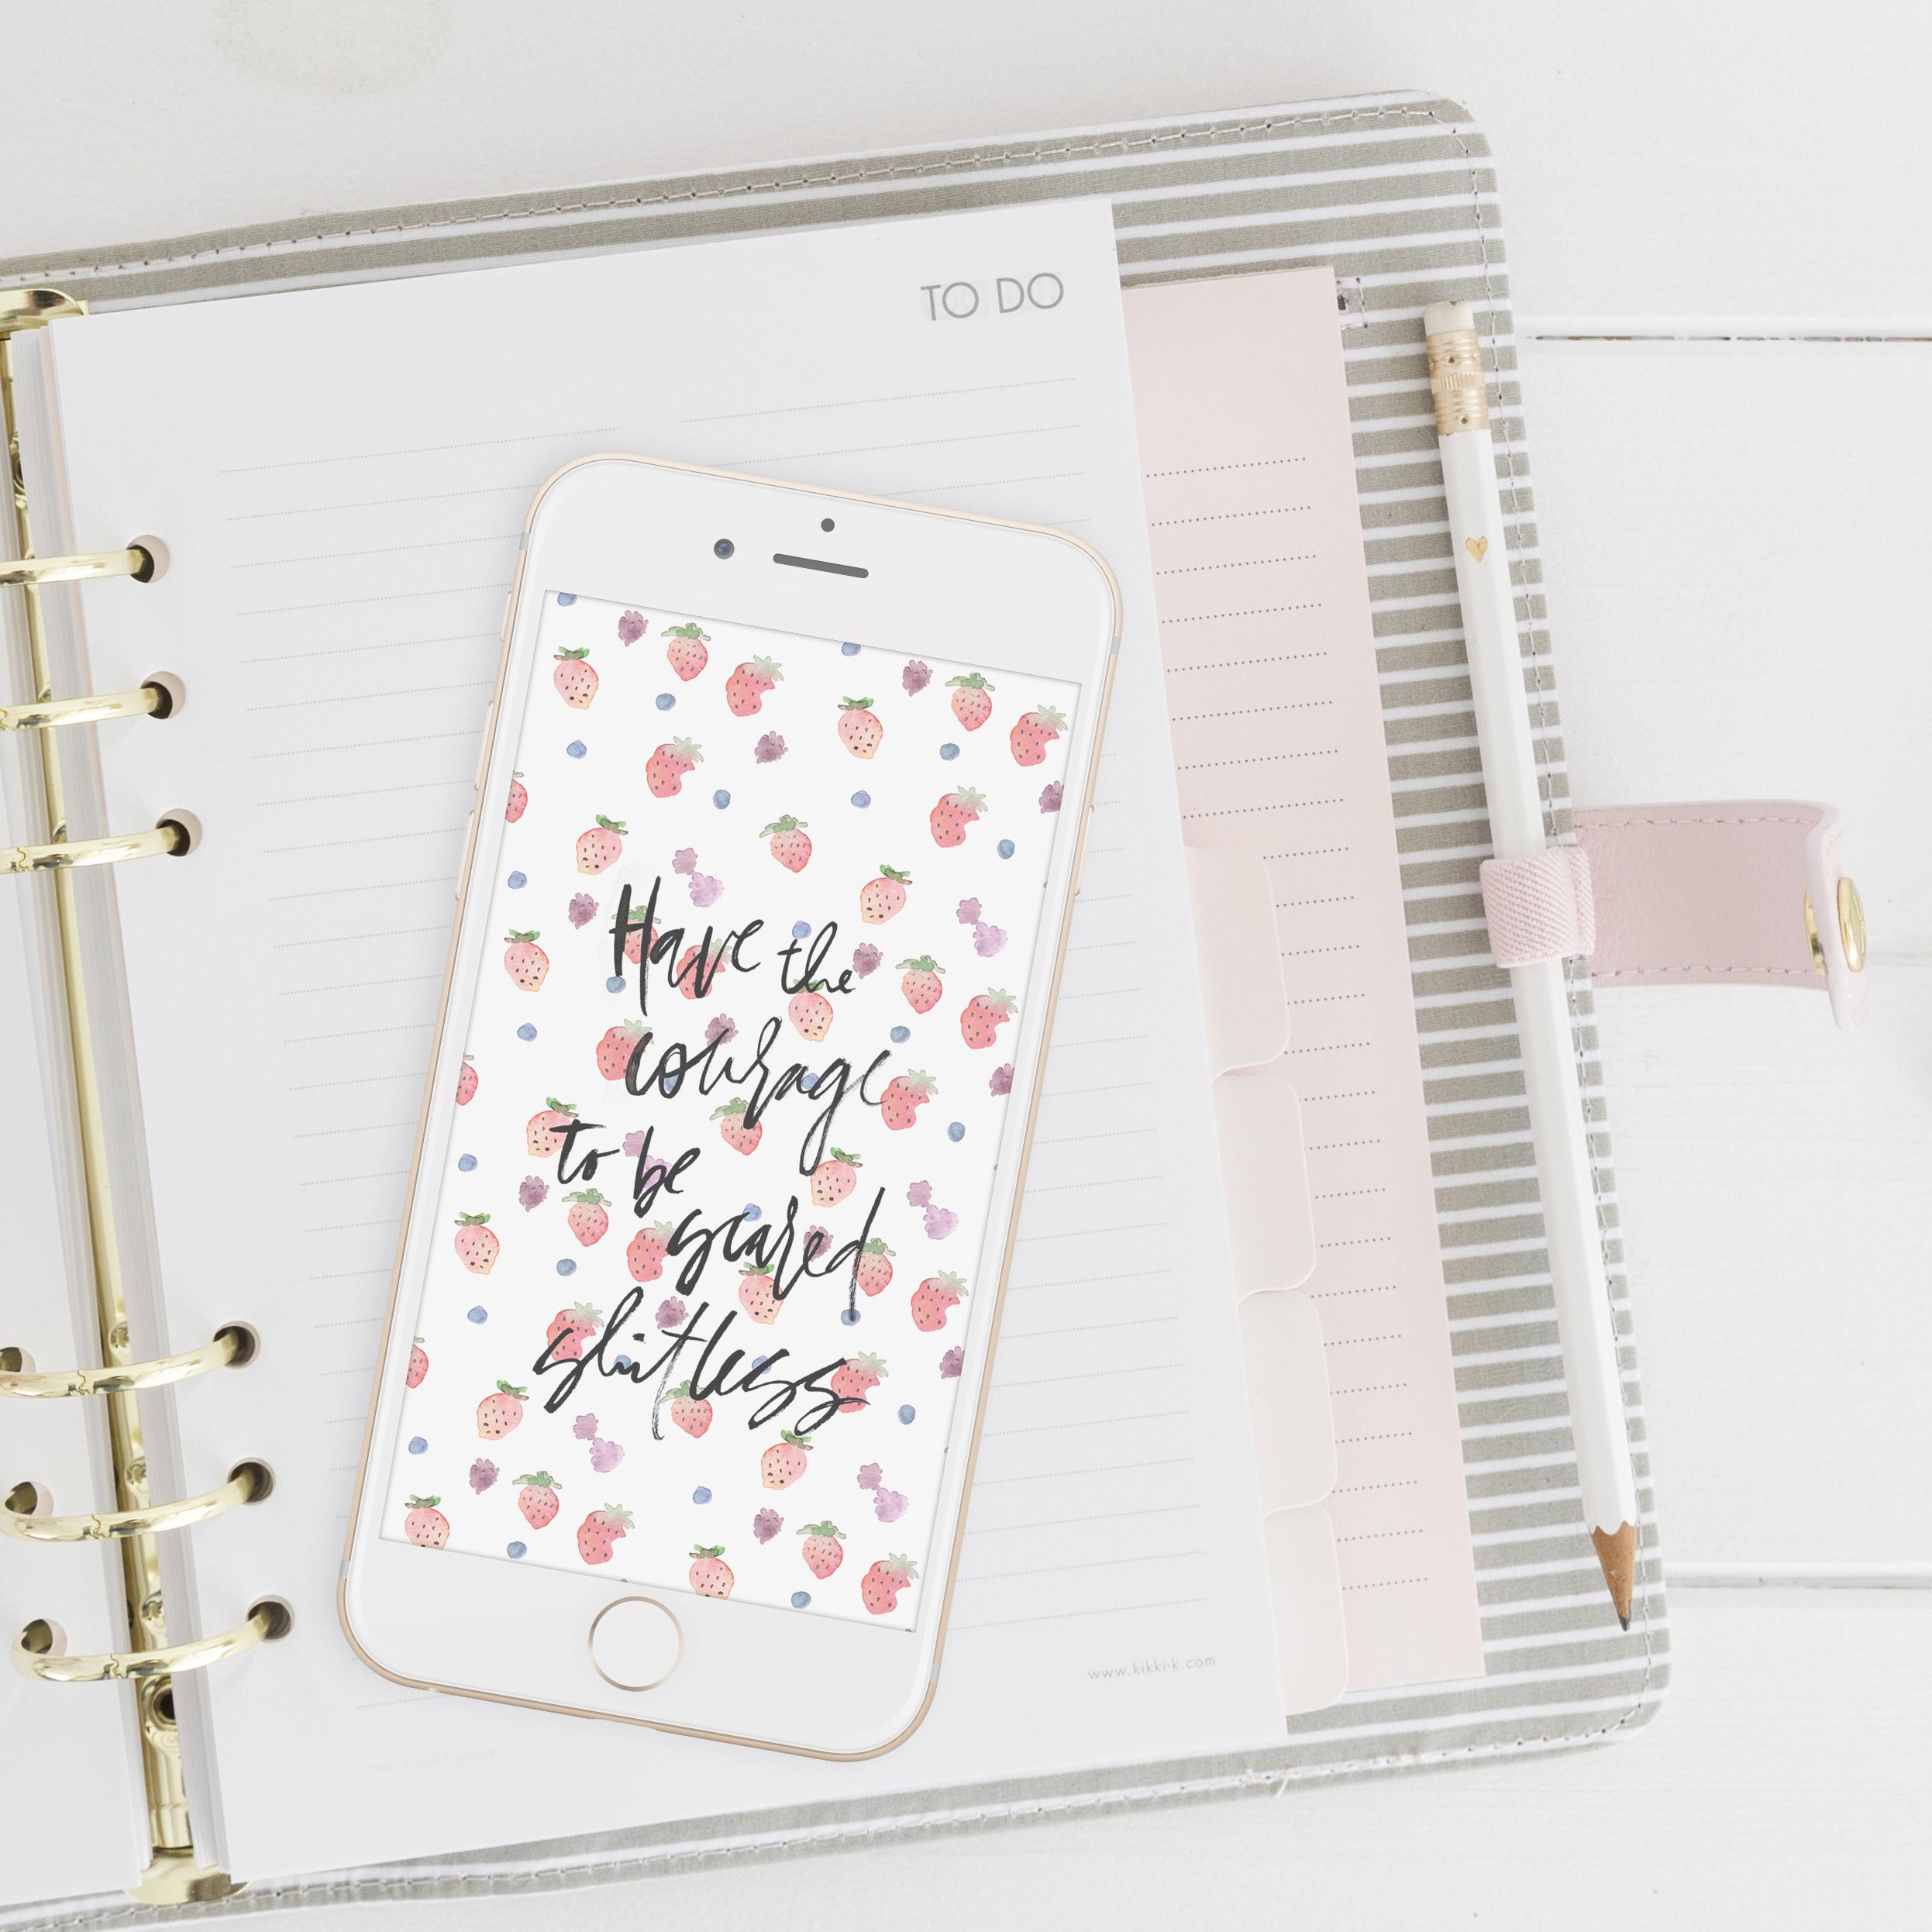 Printables + Downloads - Digital shit like wallpapers and printable planners